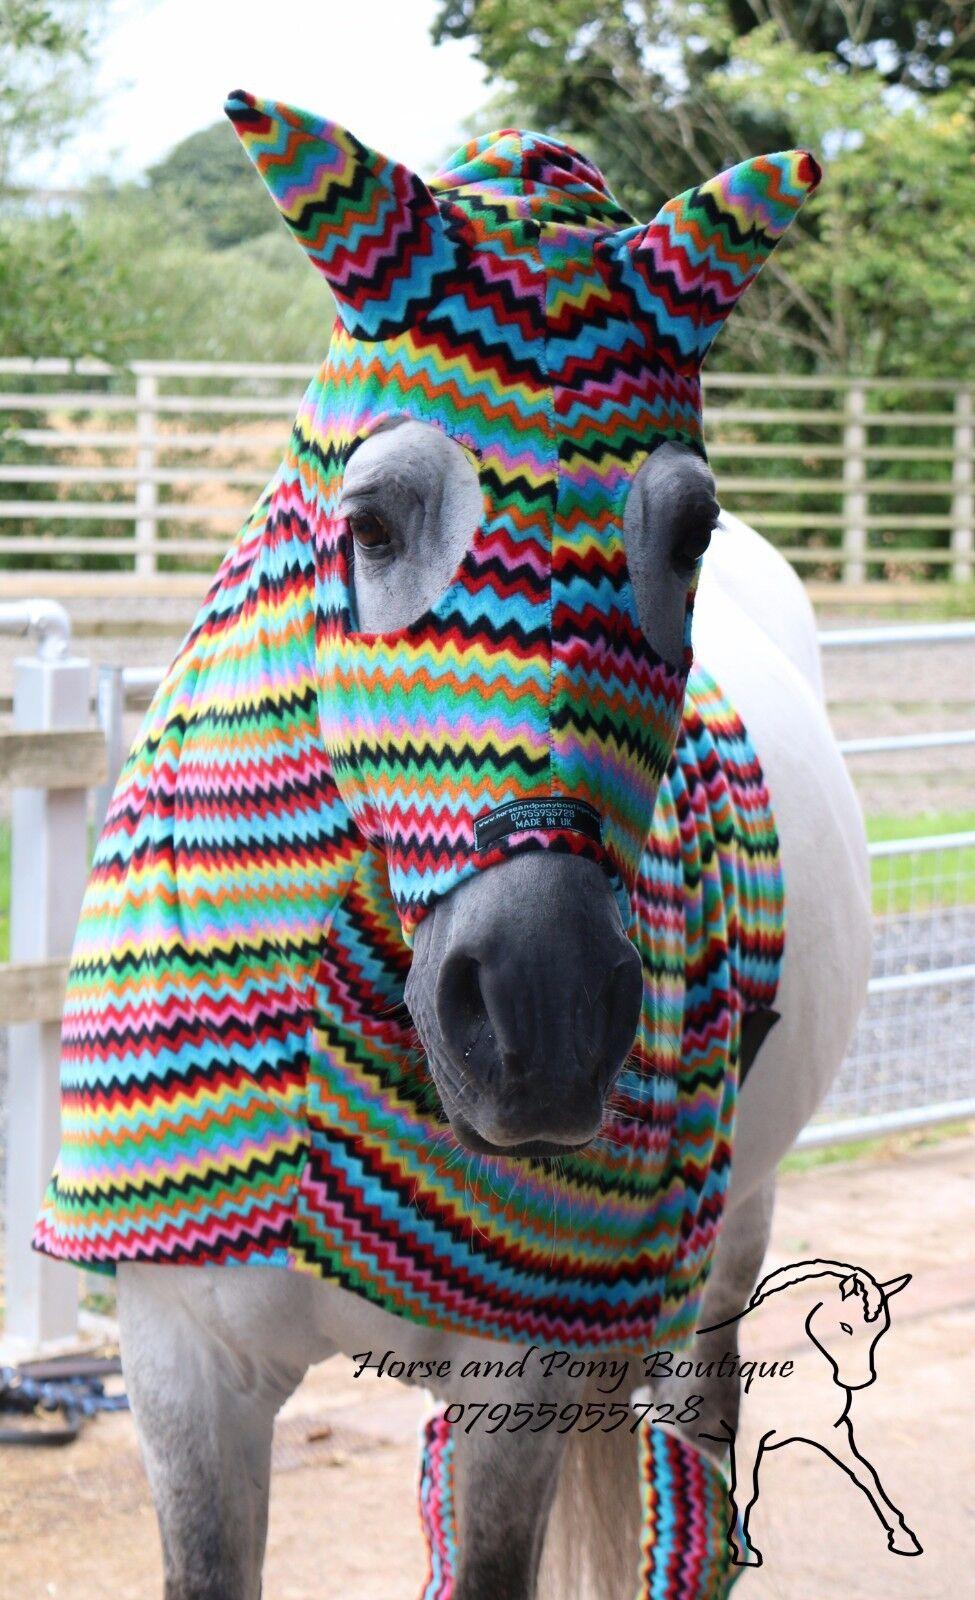 Zig ZAG FLEECE HORSE HOOD, HORSE PJAMAS PJAMAS PJAMAS a2b05a